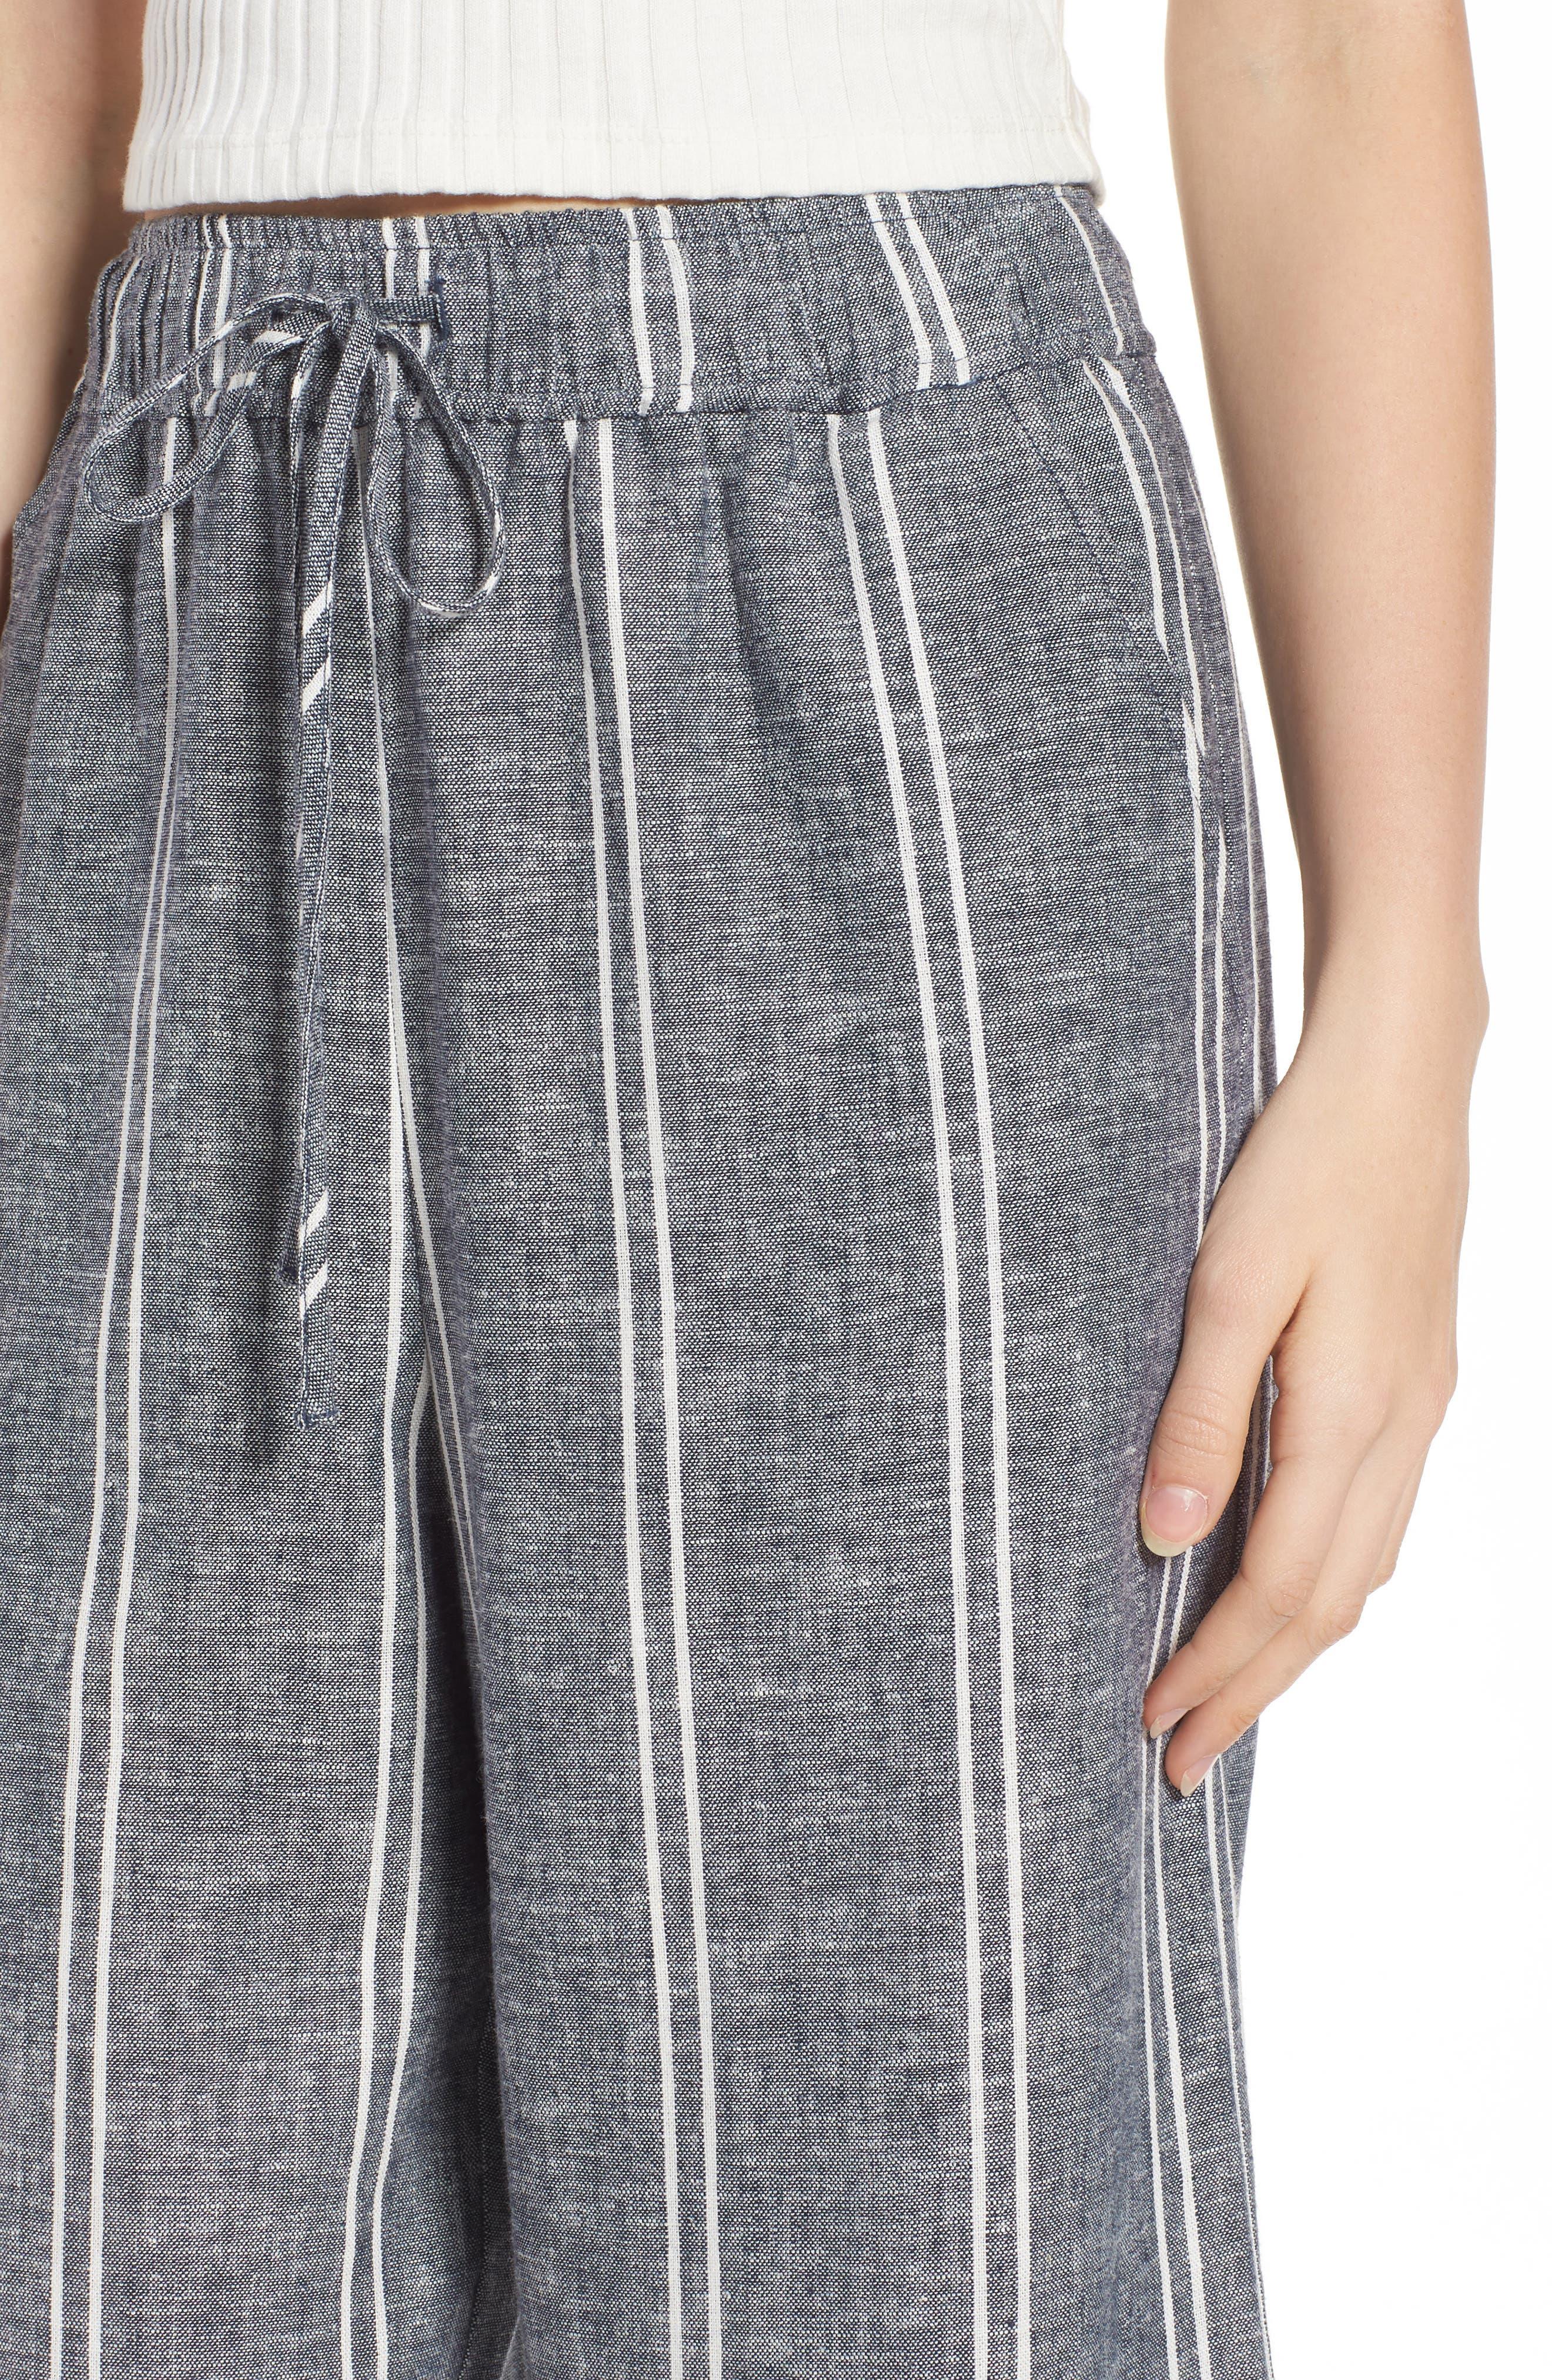 Stripe Linen Blend Culottes,                             Alternate thumbnail 4, color,                             Navy Peacoat Chambray Stripe